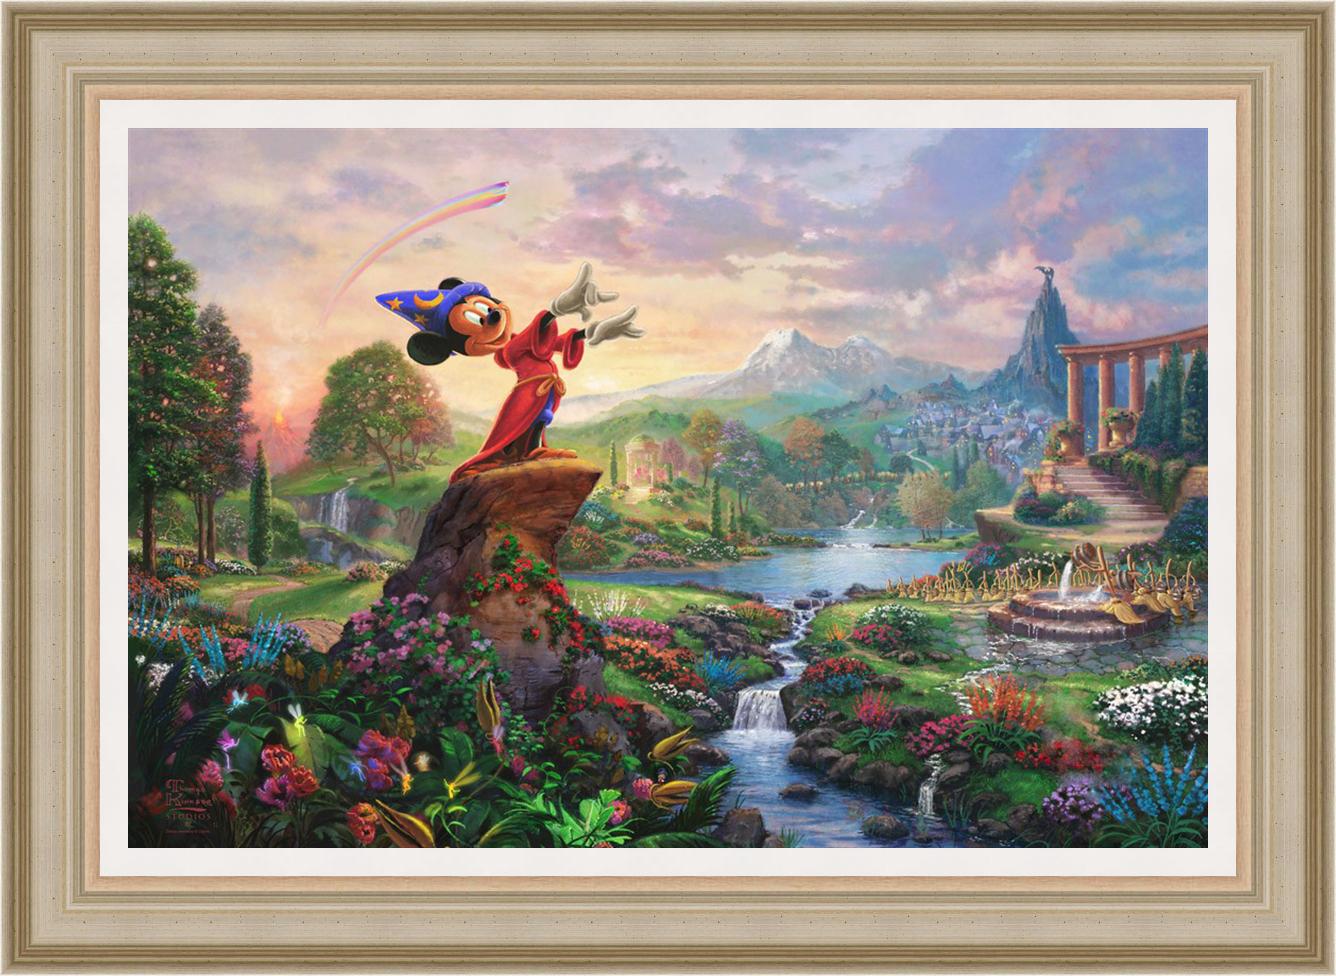 Thomas Kincade - Fantasia